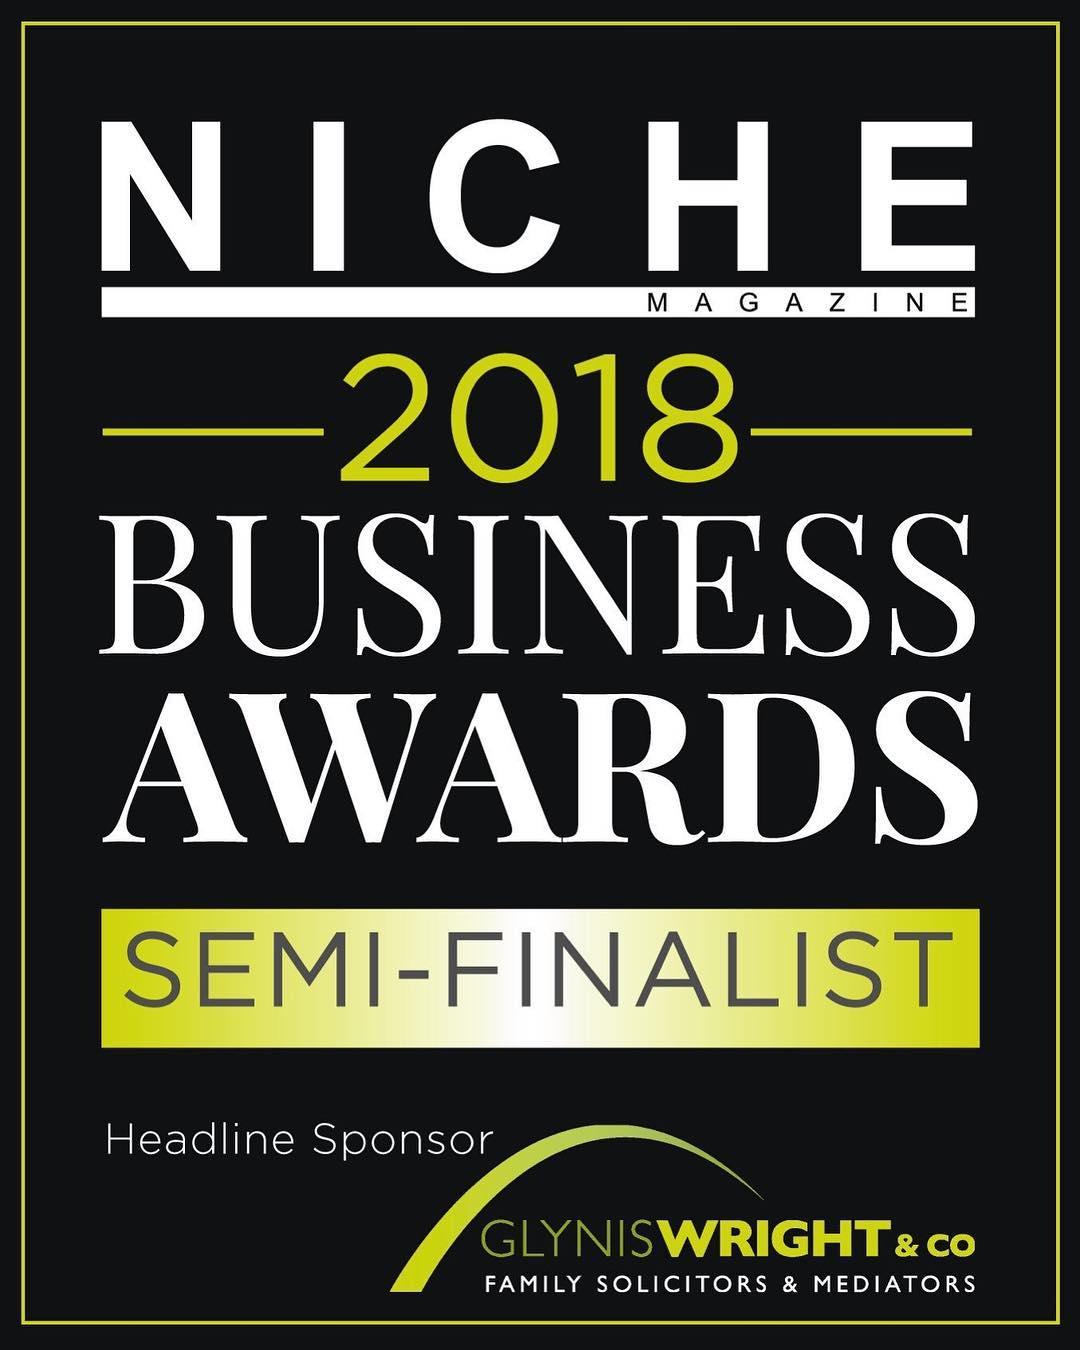 Niche 2018 business awards